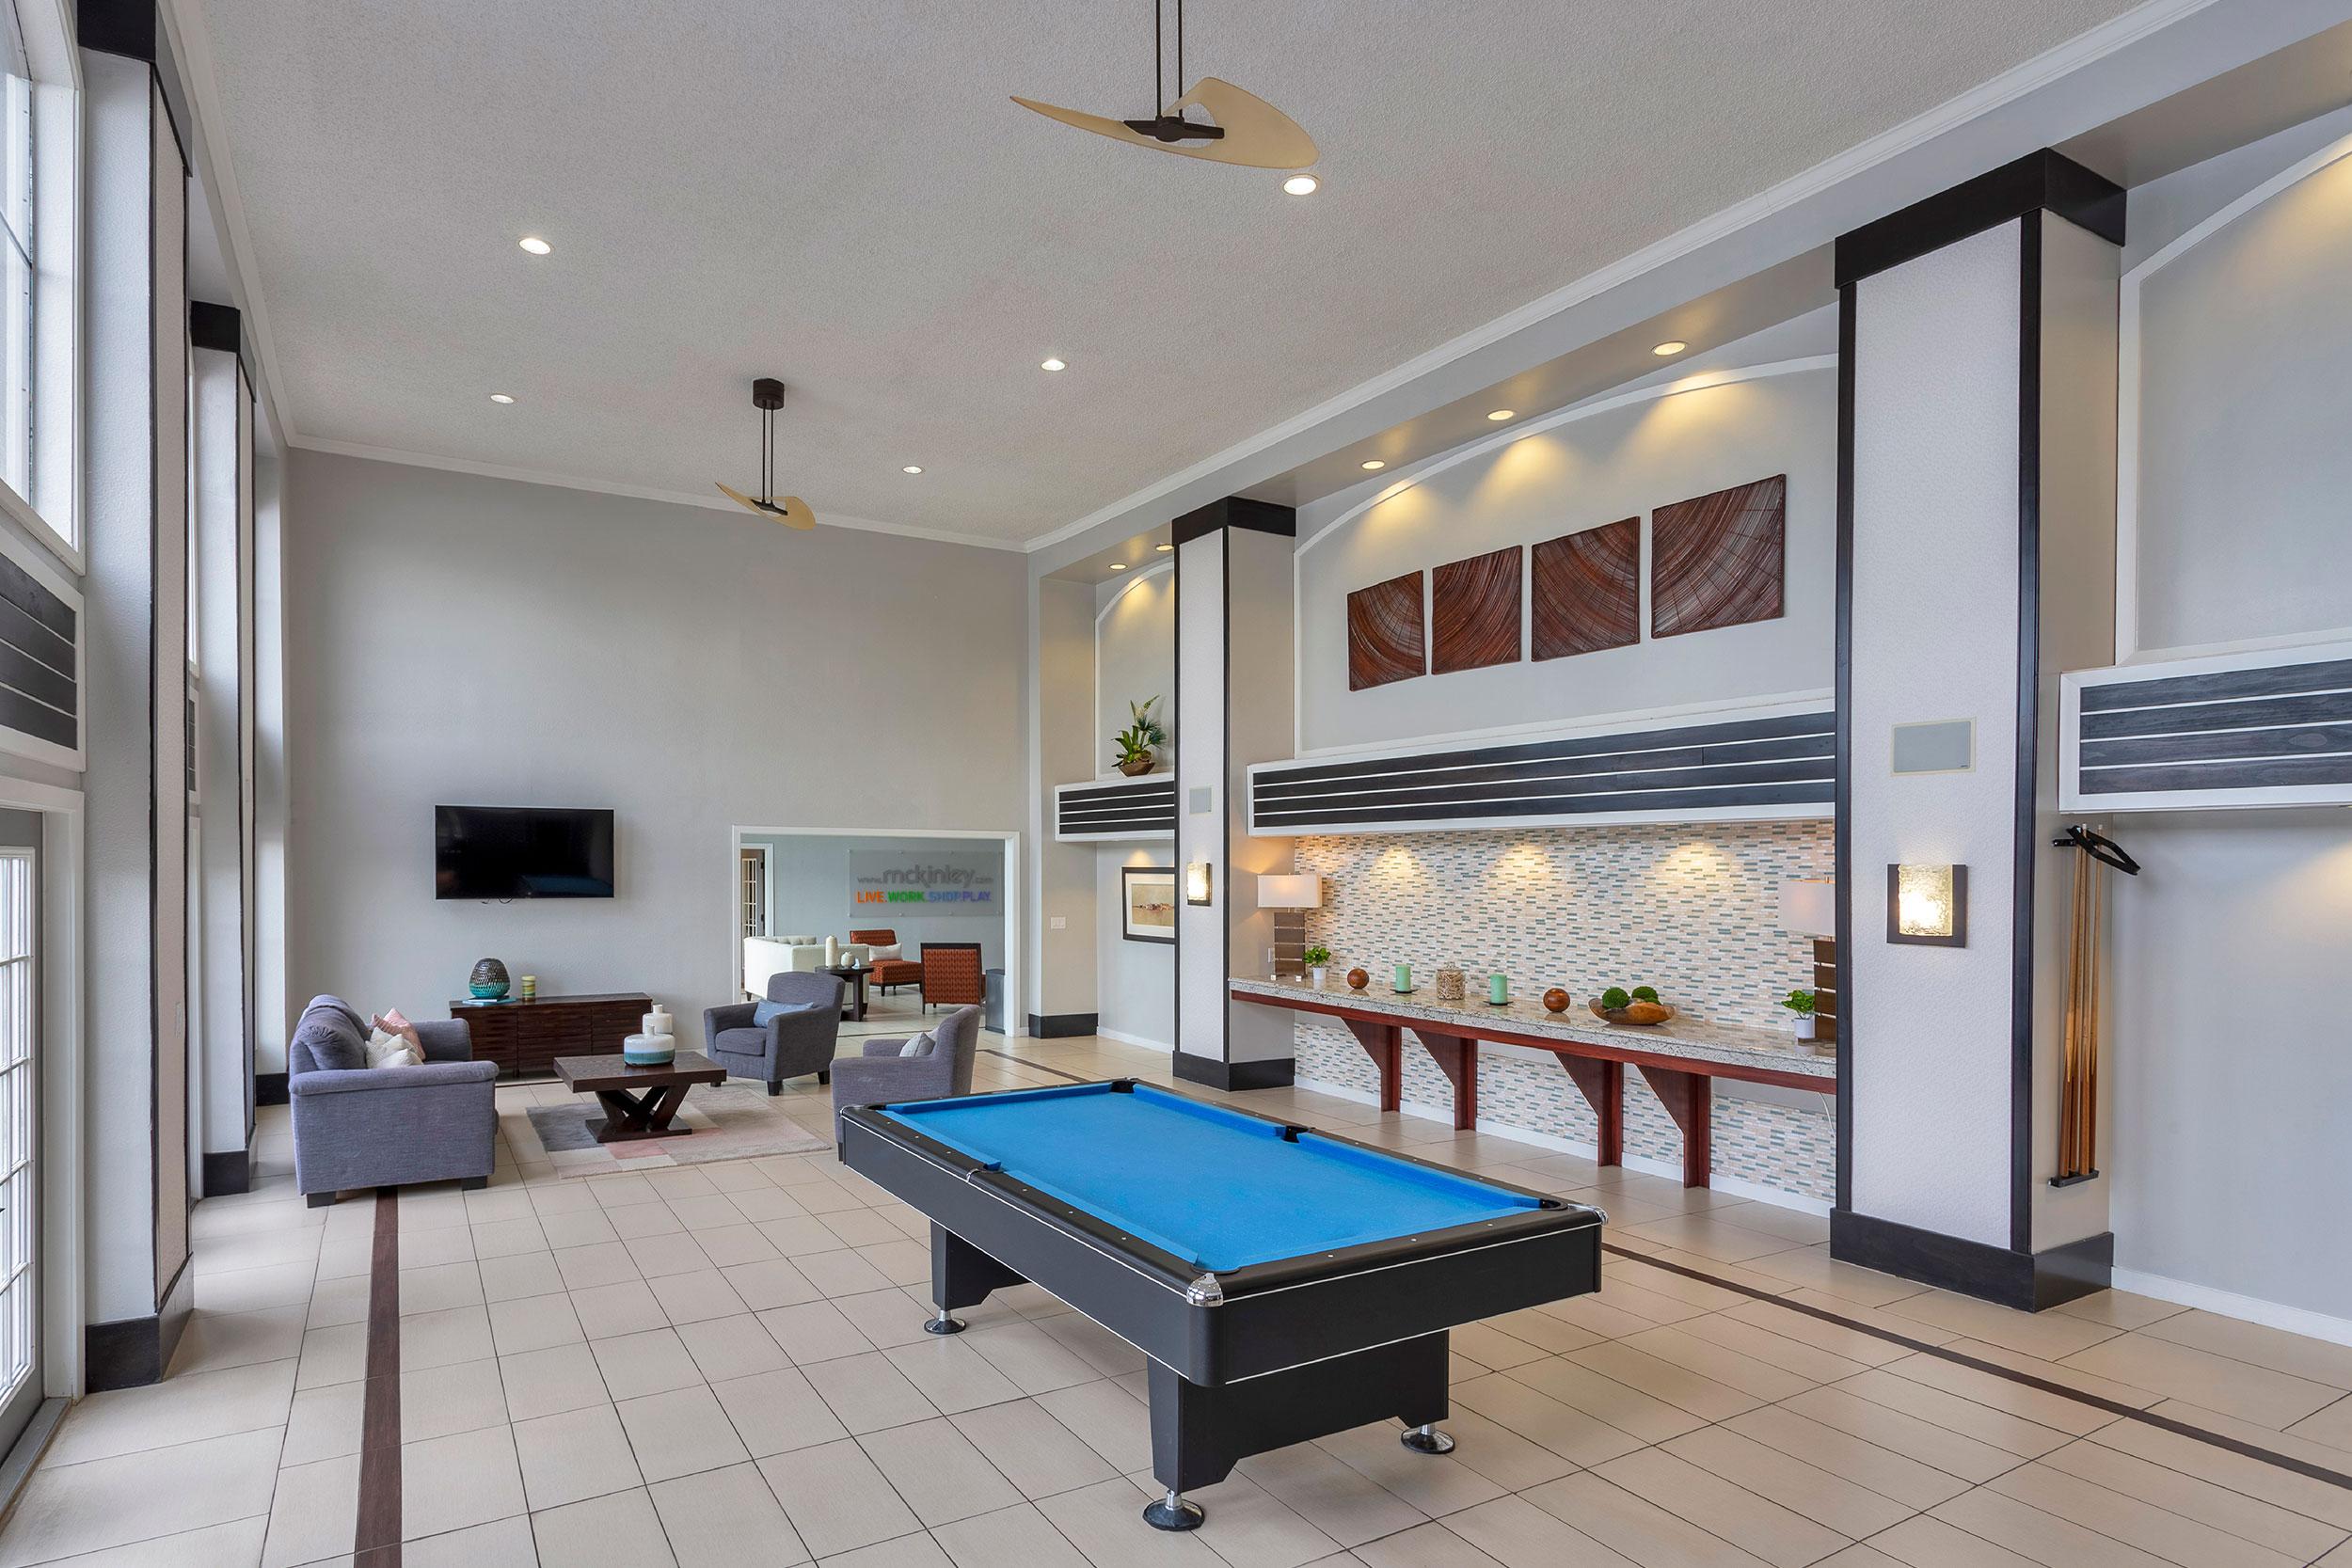 Ab-amen-clubhouse-interior